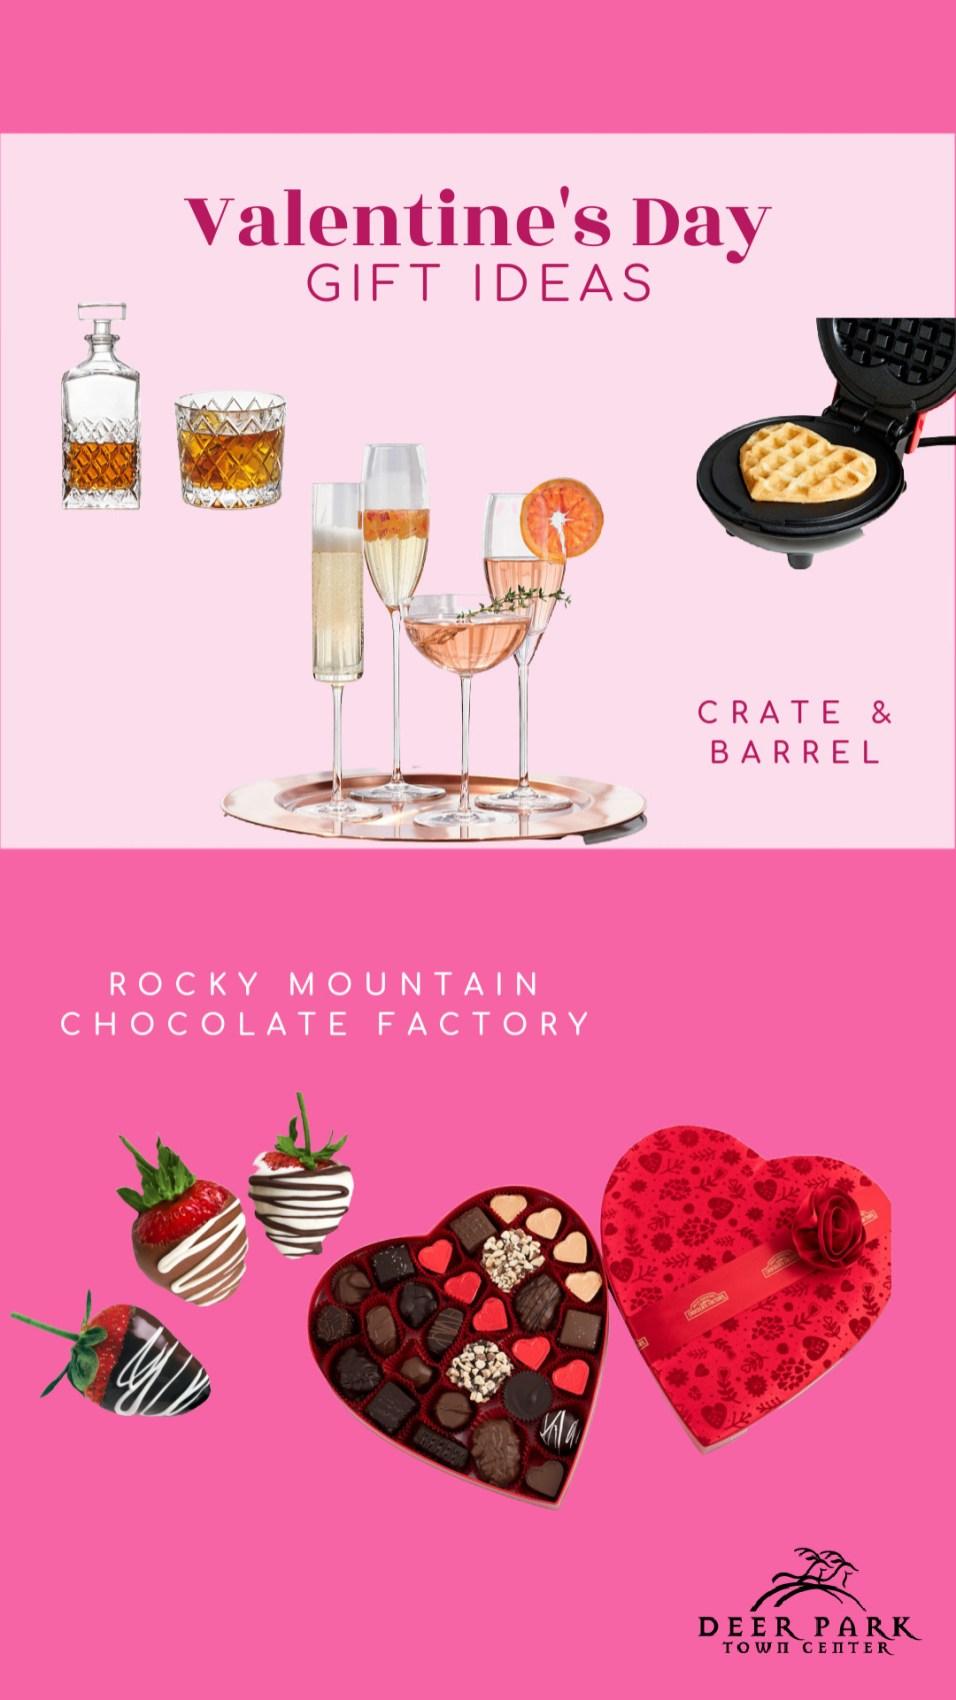 Deer Park Town Center - Valentine's Day Gifts 2021 - 4